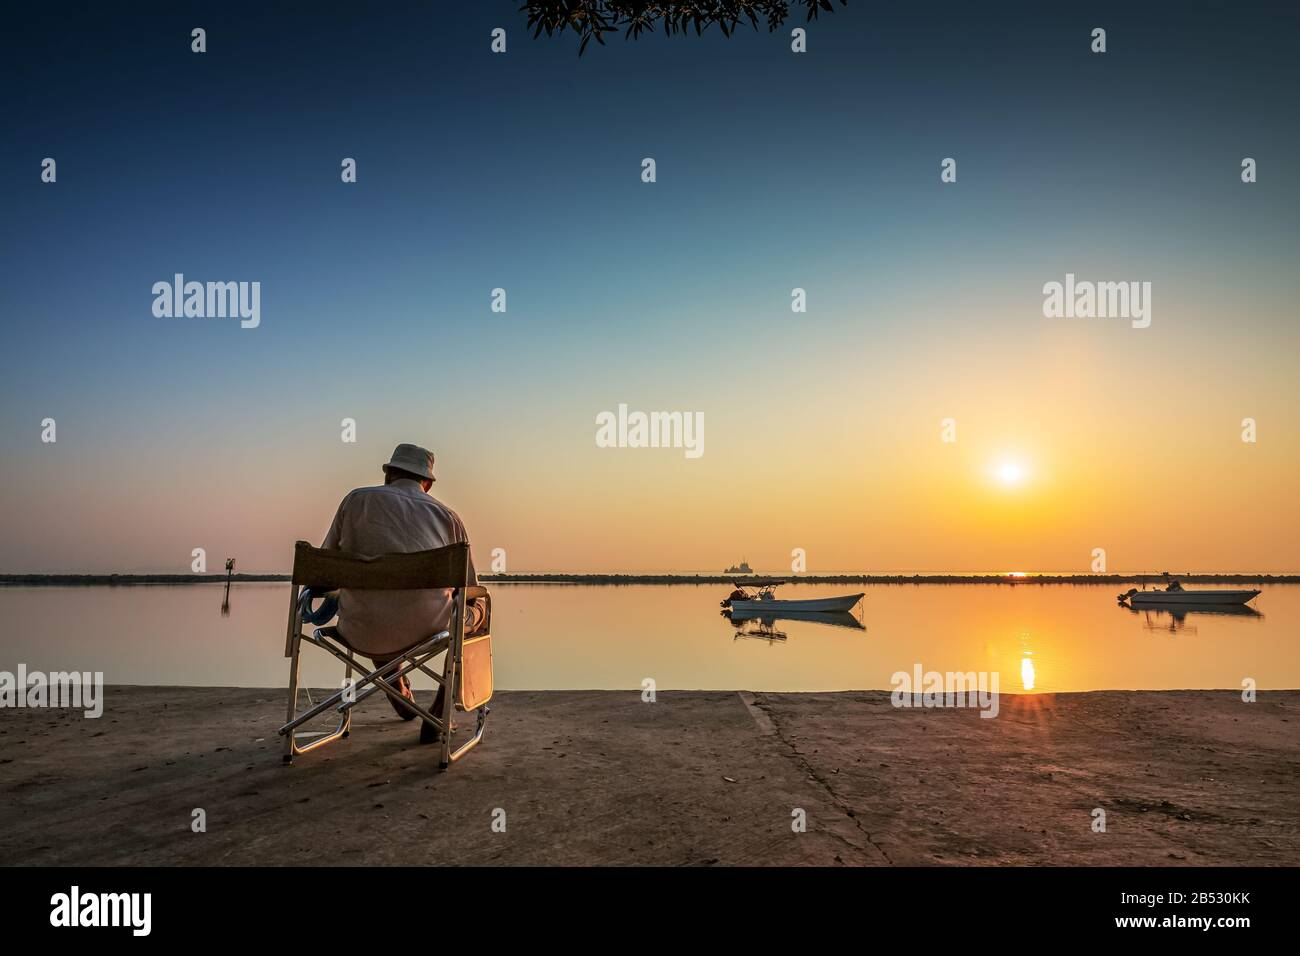 Fin de semana Old Man pesca en Dammam lado del mar Arabia Saudita. Foto de stock